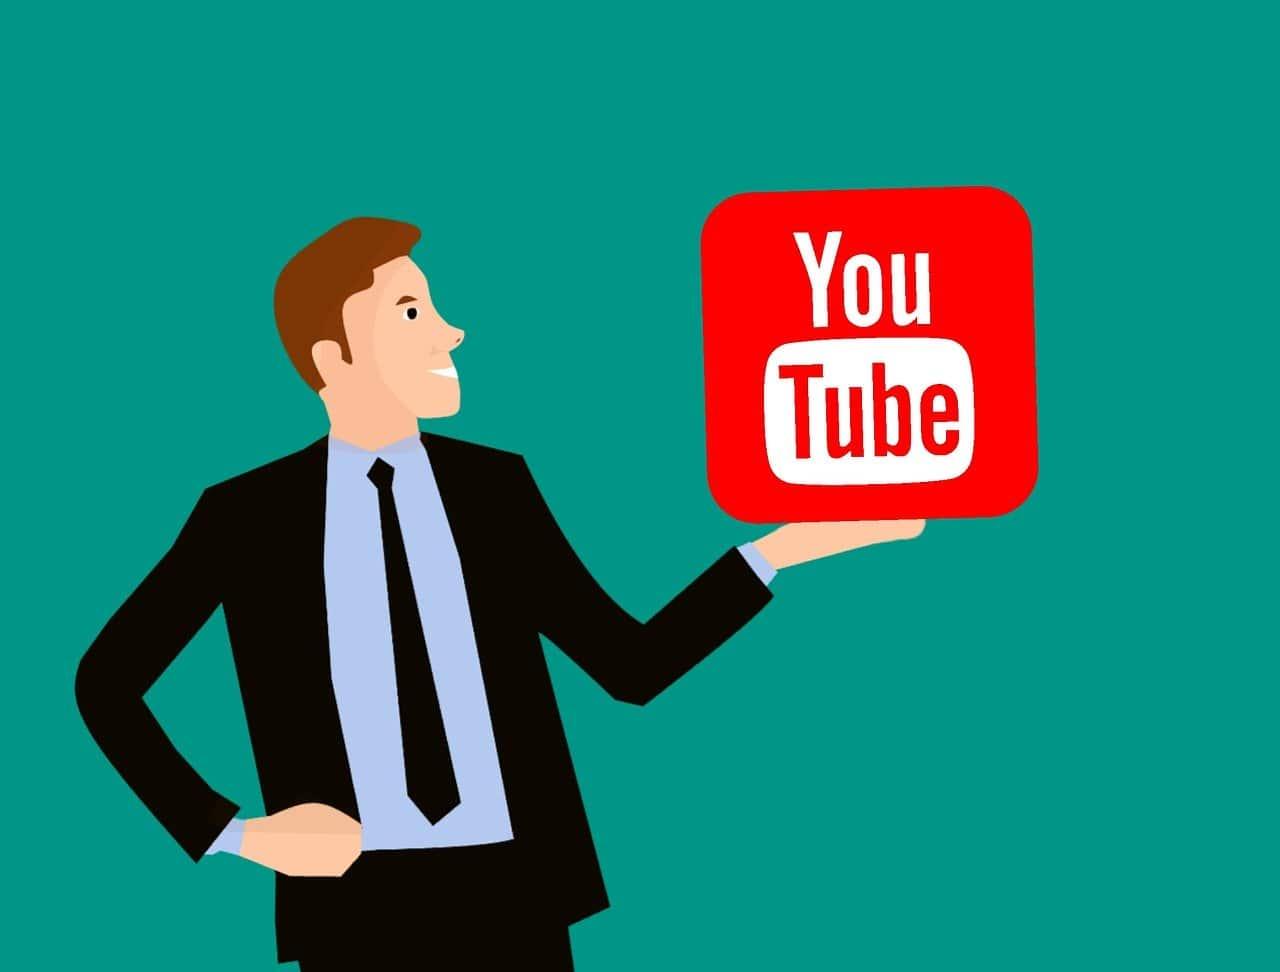 YouTube Marketer